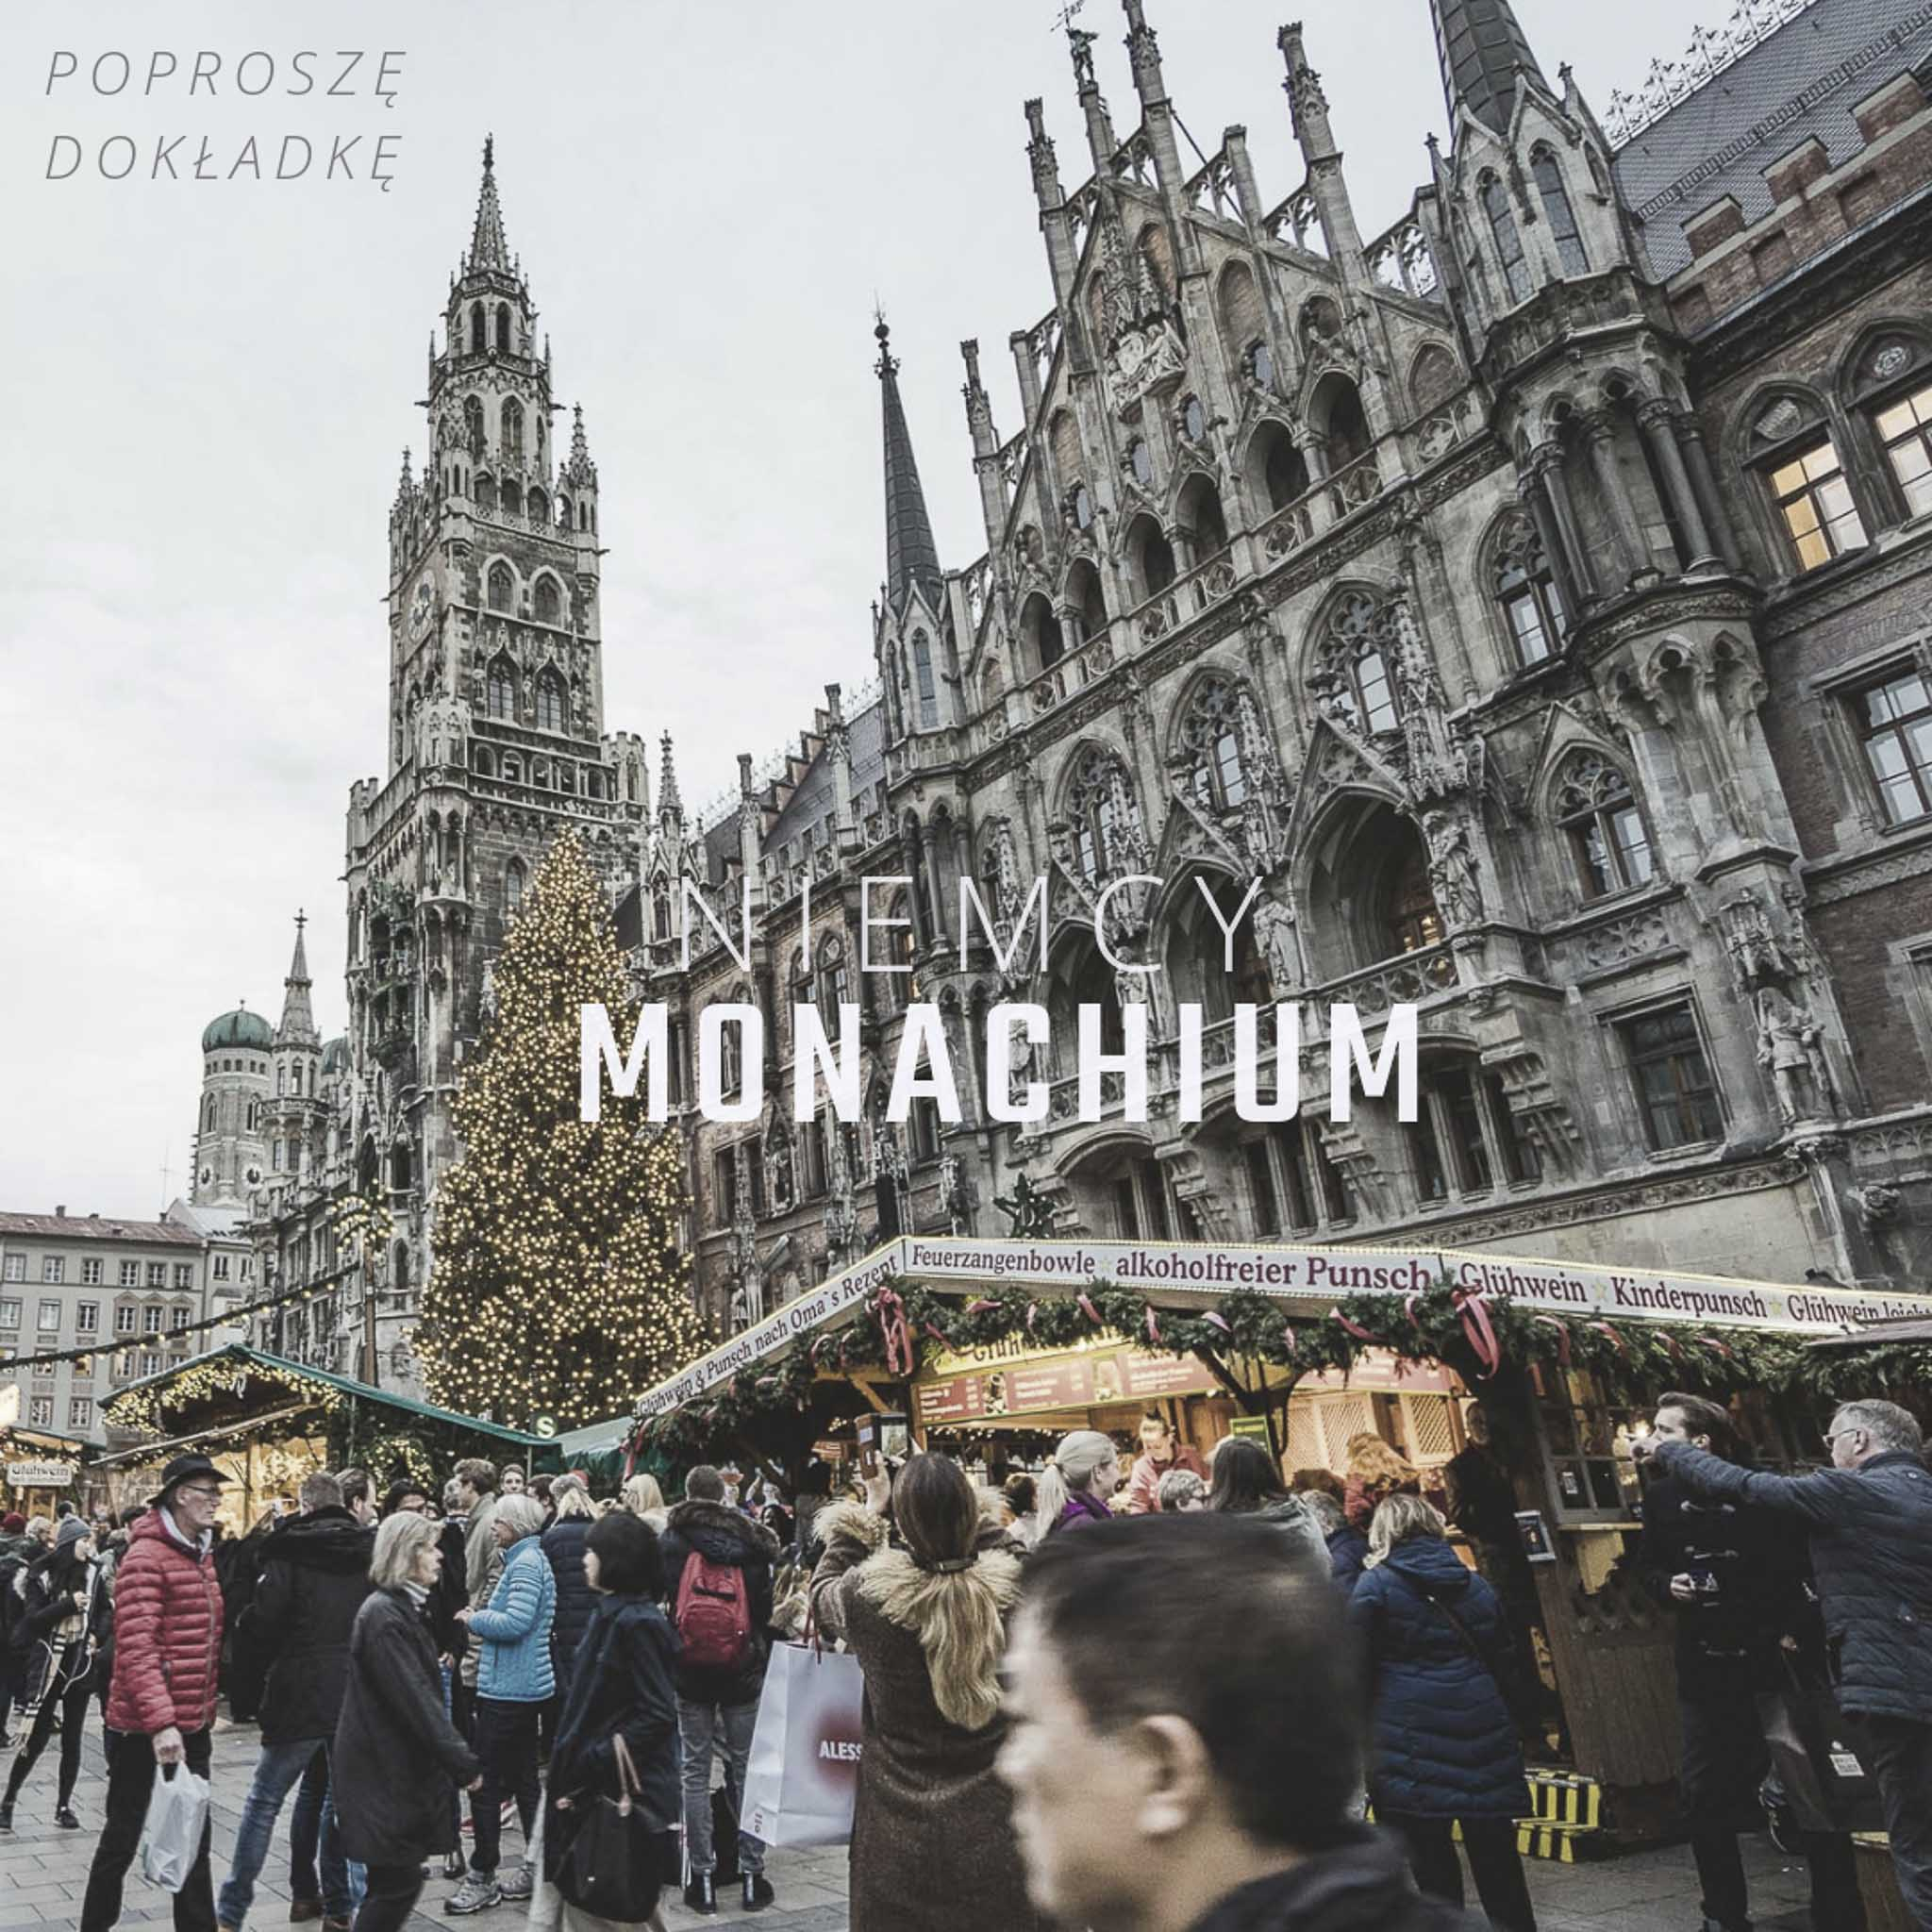 Niemcy - Monachium